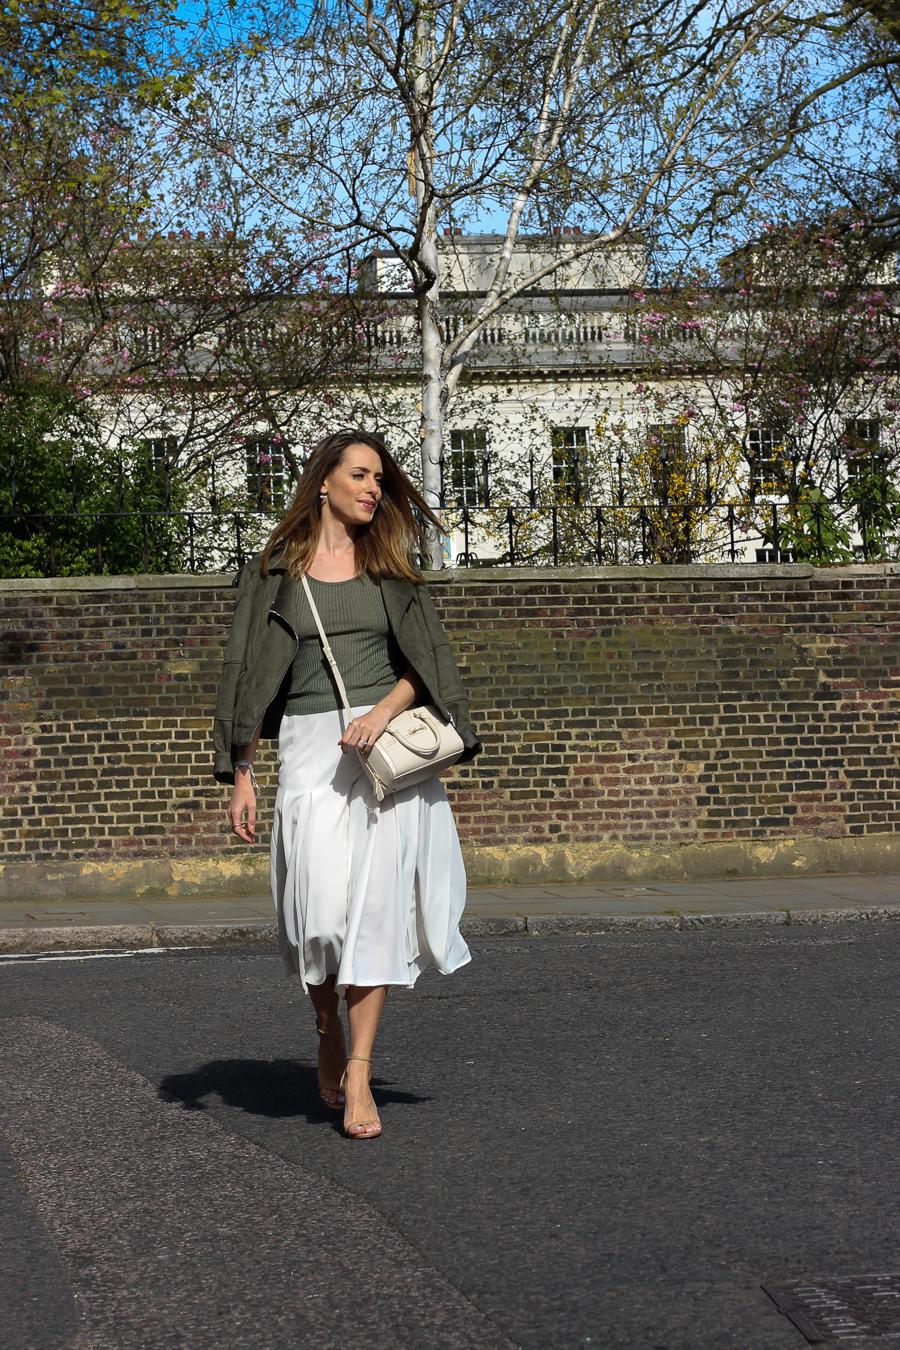 Folli Follie UK - Clutch and carry on - uk travel blogger, uk fashion blogger, london street style, sabrina chakici tblogger-46